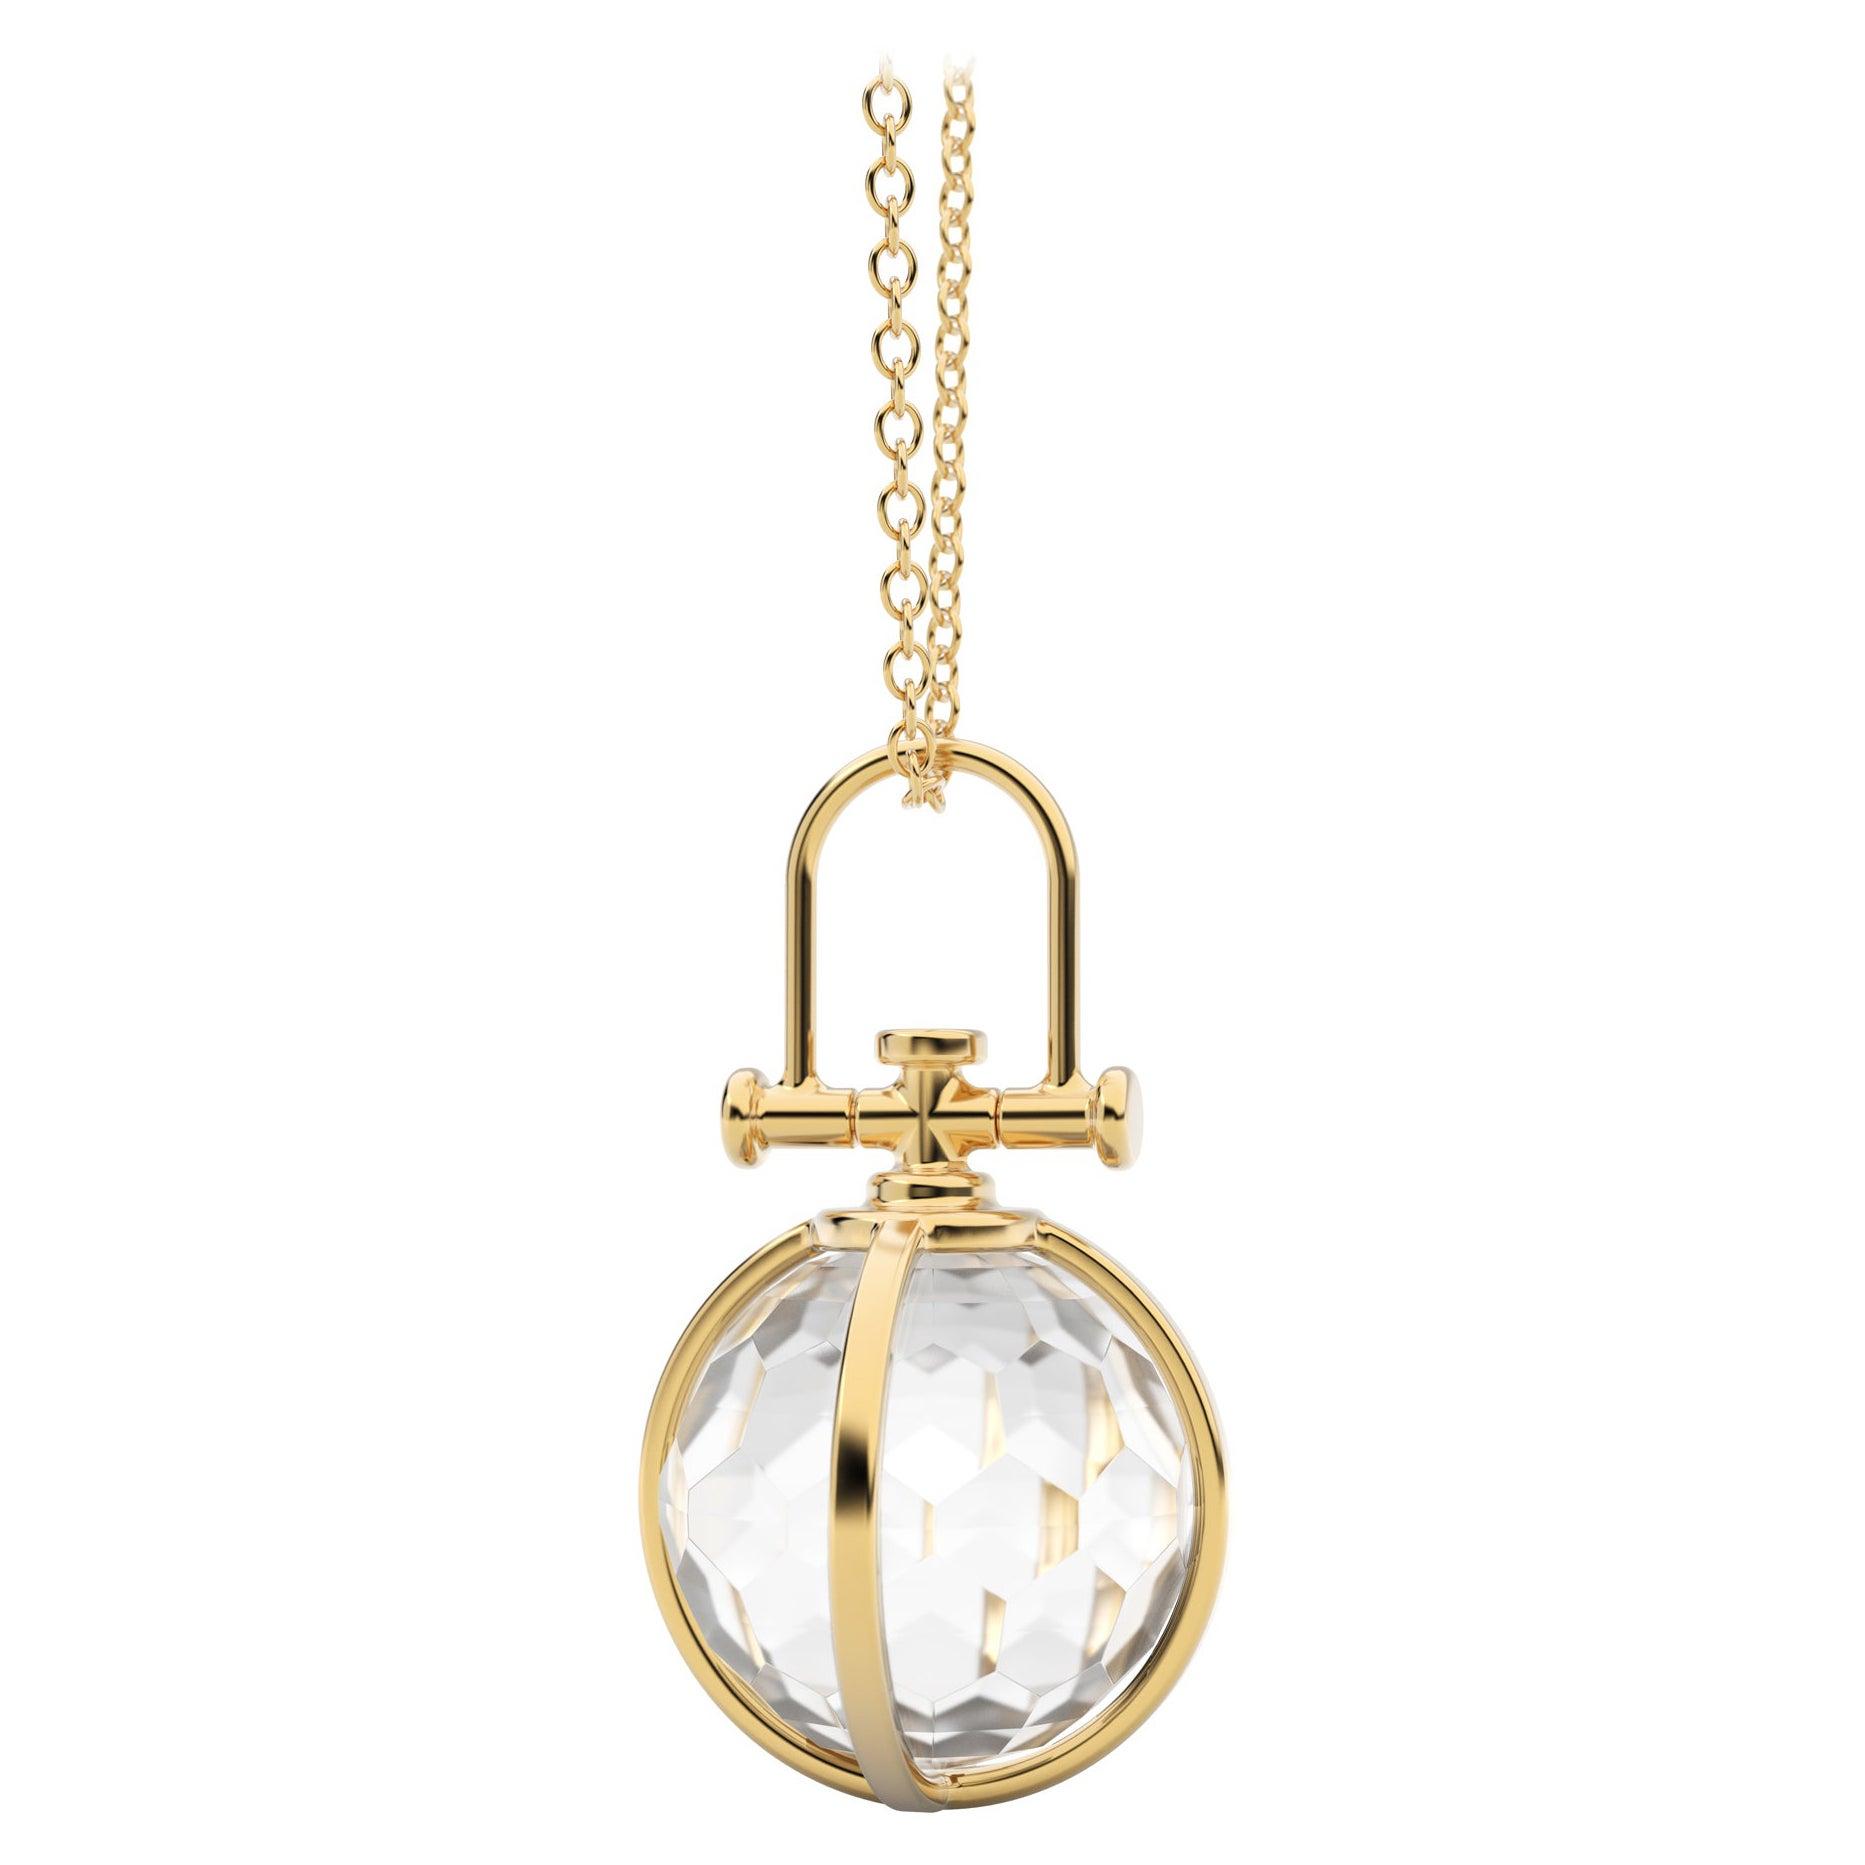 Modern Sacred 18K Gold Faceted Crystal Orb Amulet Necklace with Rock Crystal